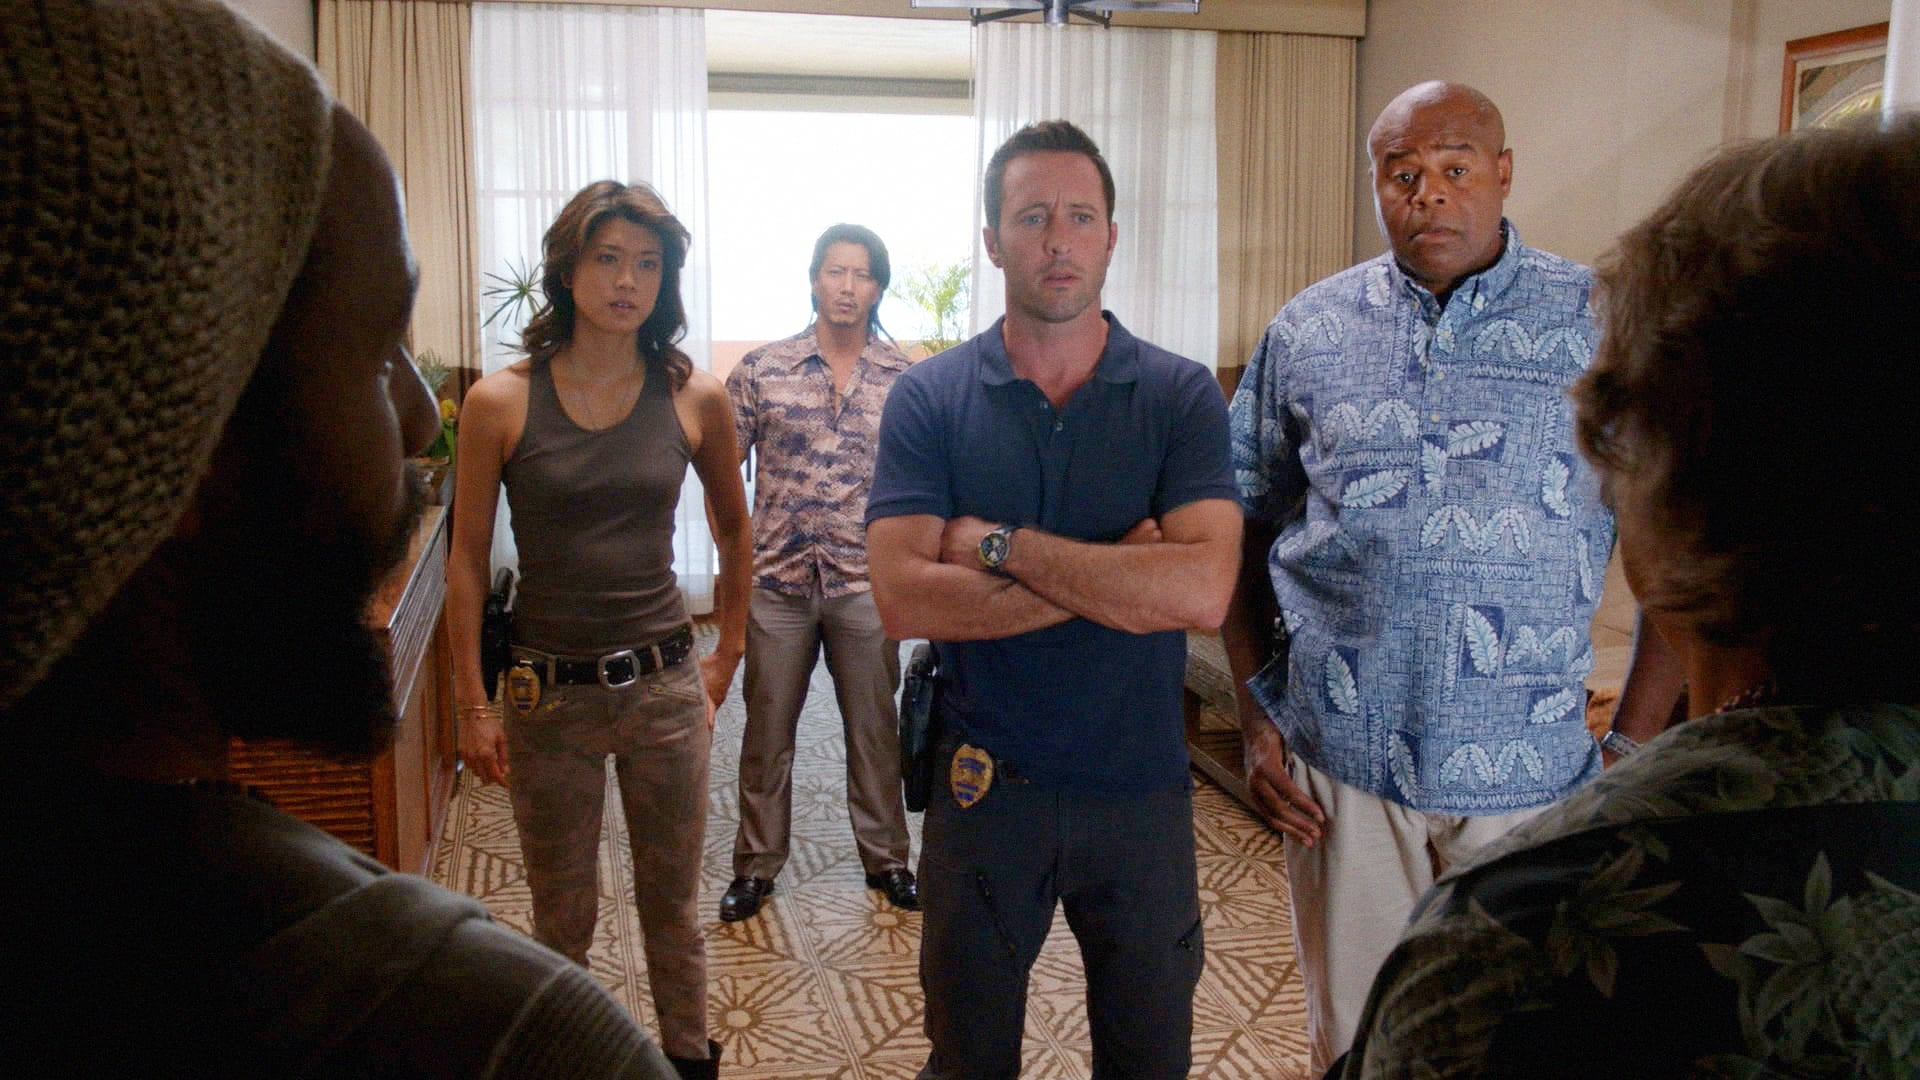 Hawaii Five-0 - Season 6 Episode 16 : Ka Pohaku Kihi Pa'a (The Solid Cornerstone)